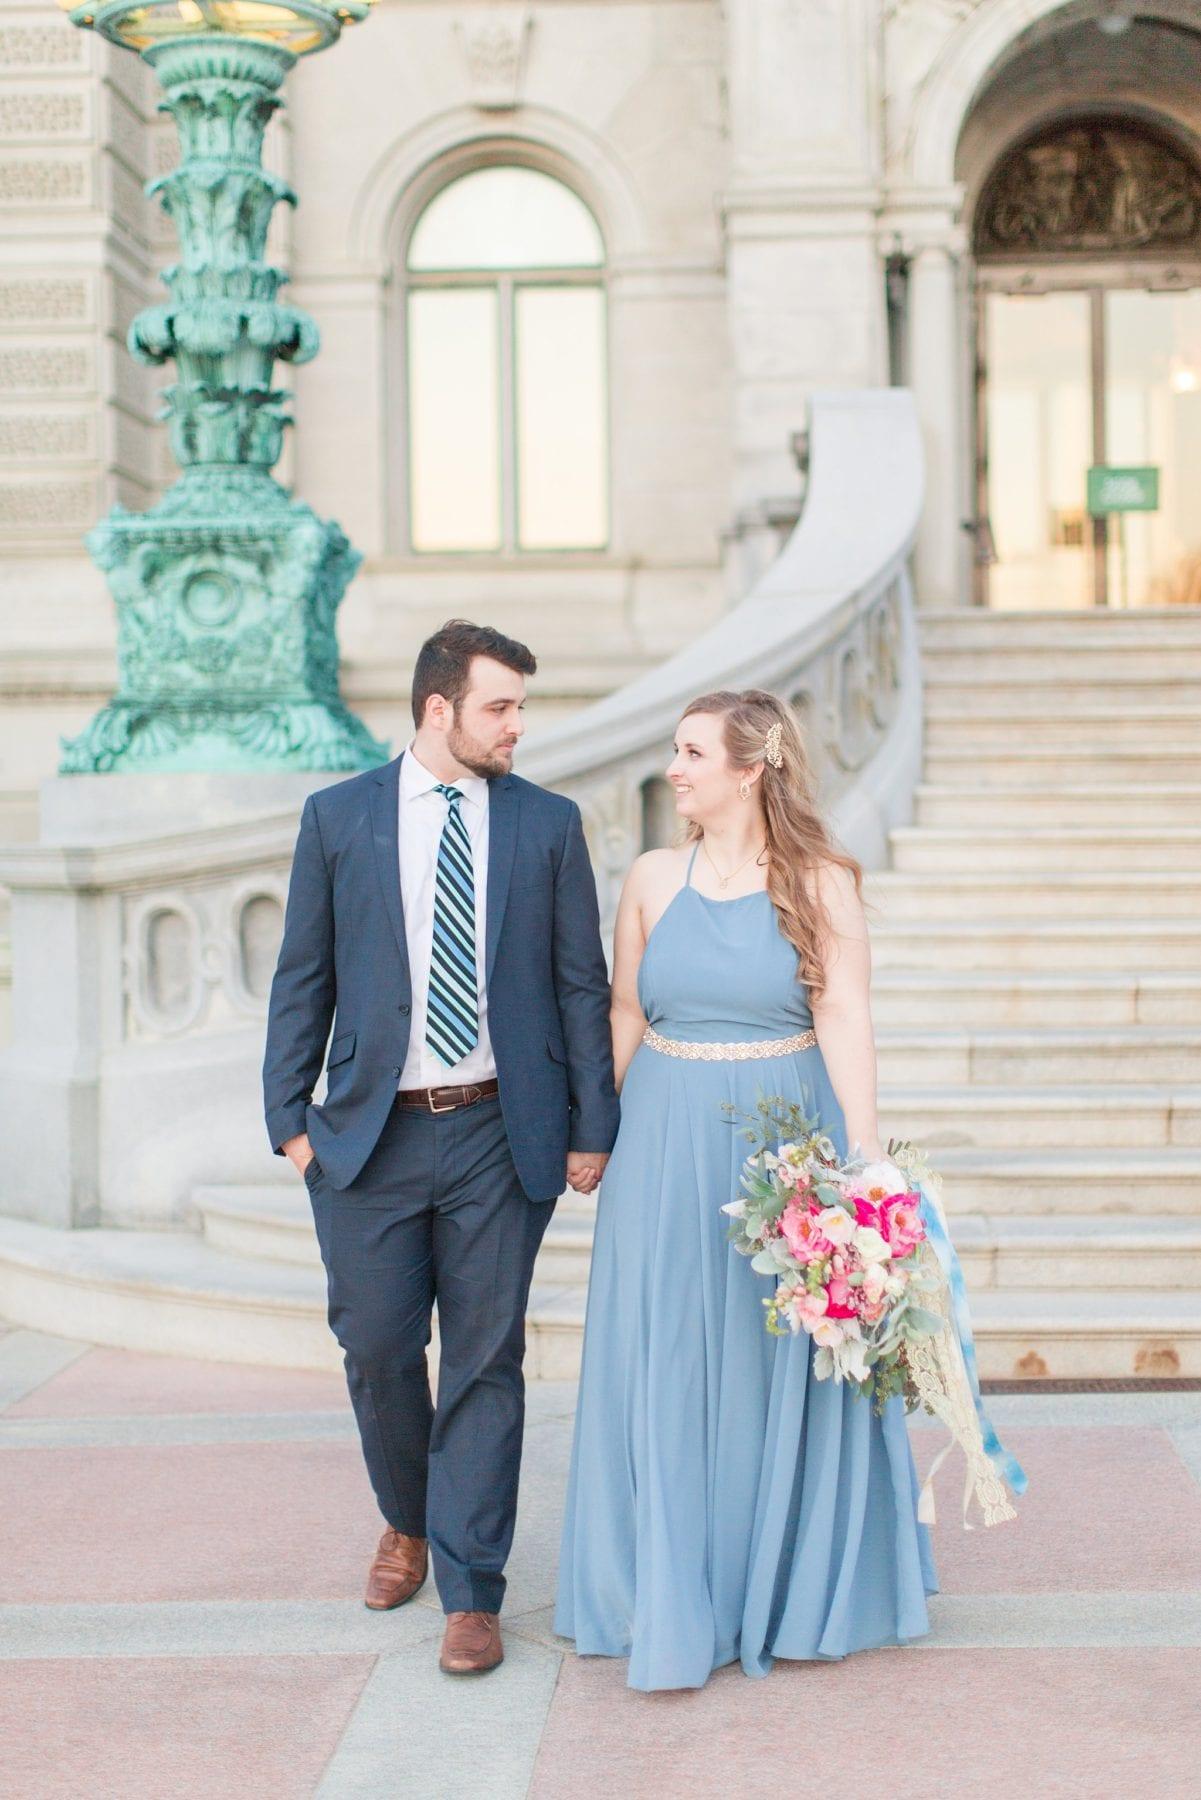 Capitol Hill Engagement Photos Kelly & Zach Washington DC Wedding Photographer Megan Kelsey Photography-356.jpg